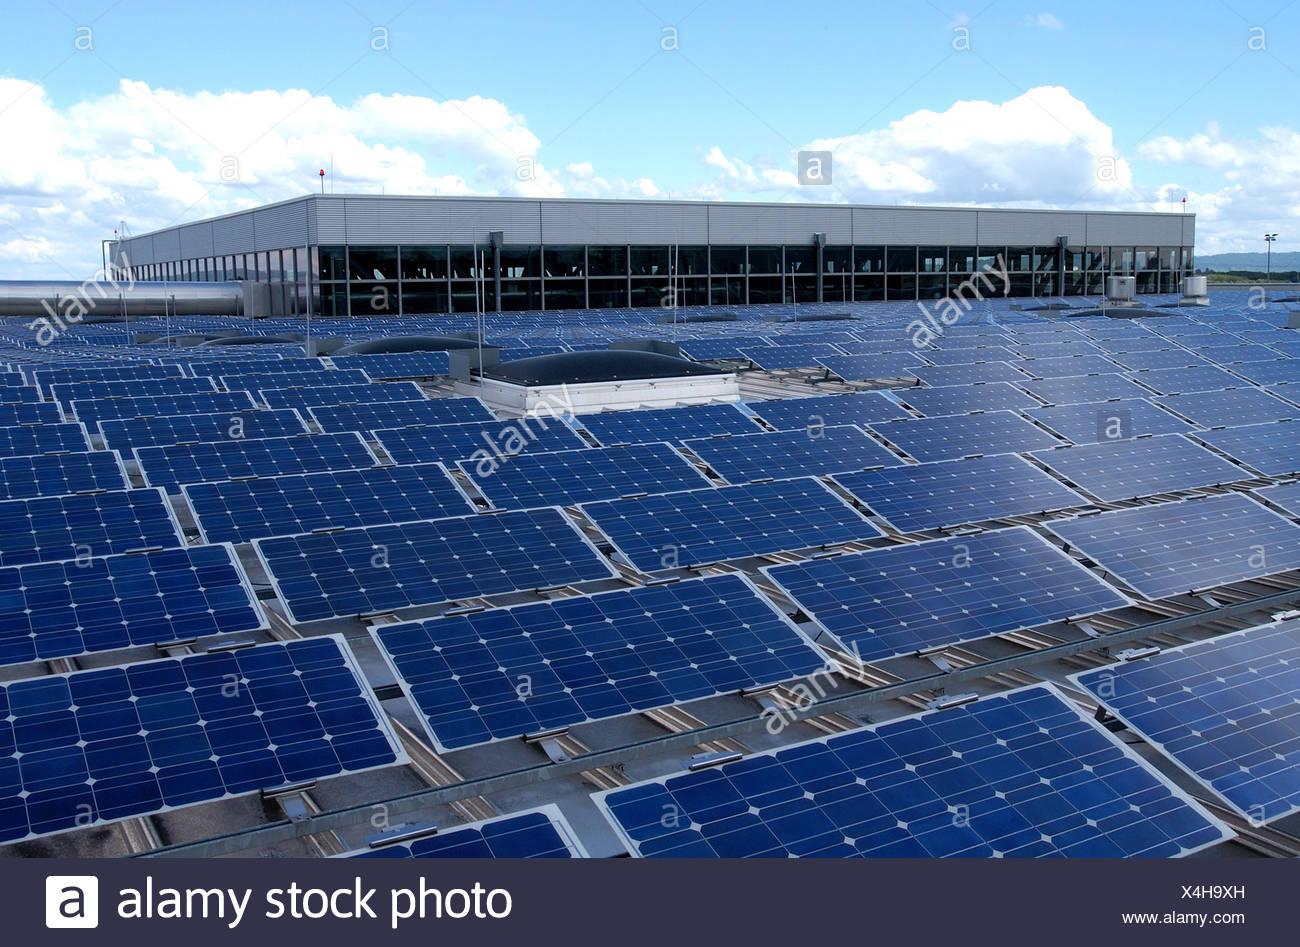 Solar power plant in Freiburg - Stock Image